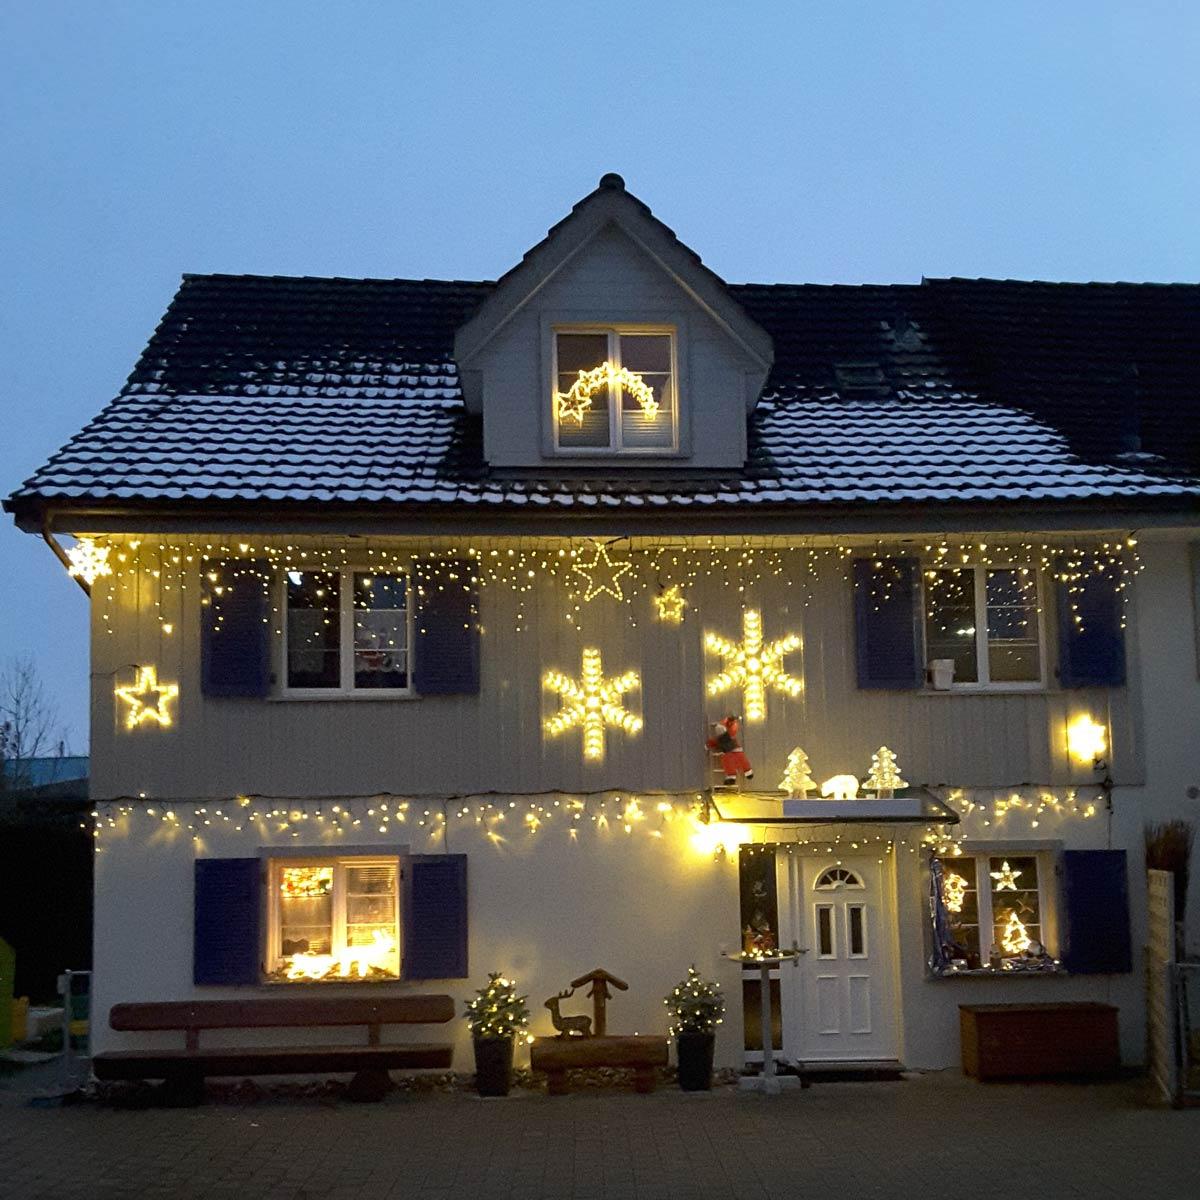 Leuchthaus mit Lichterketten Icicle System 24 LED